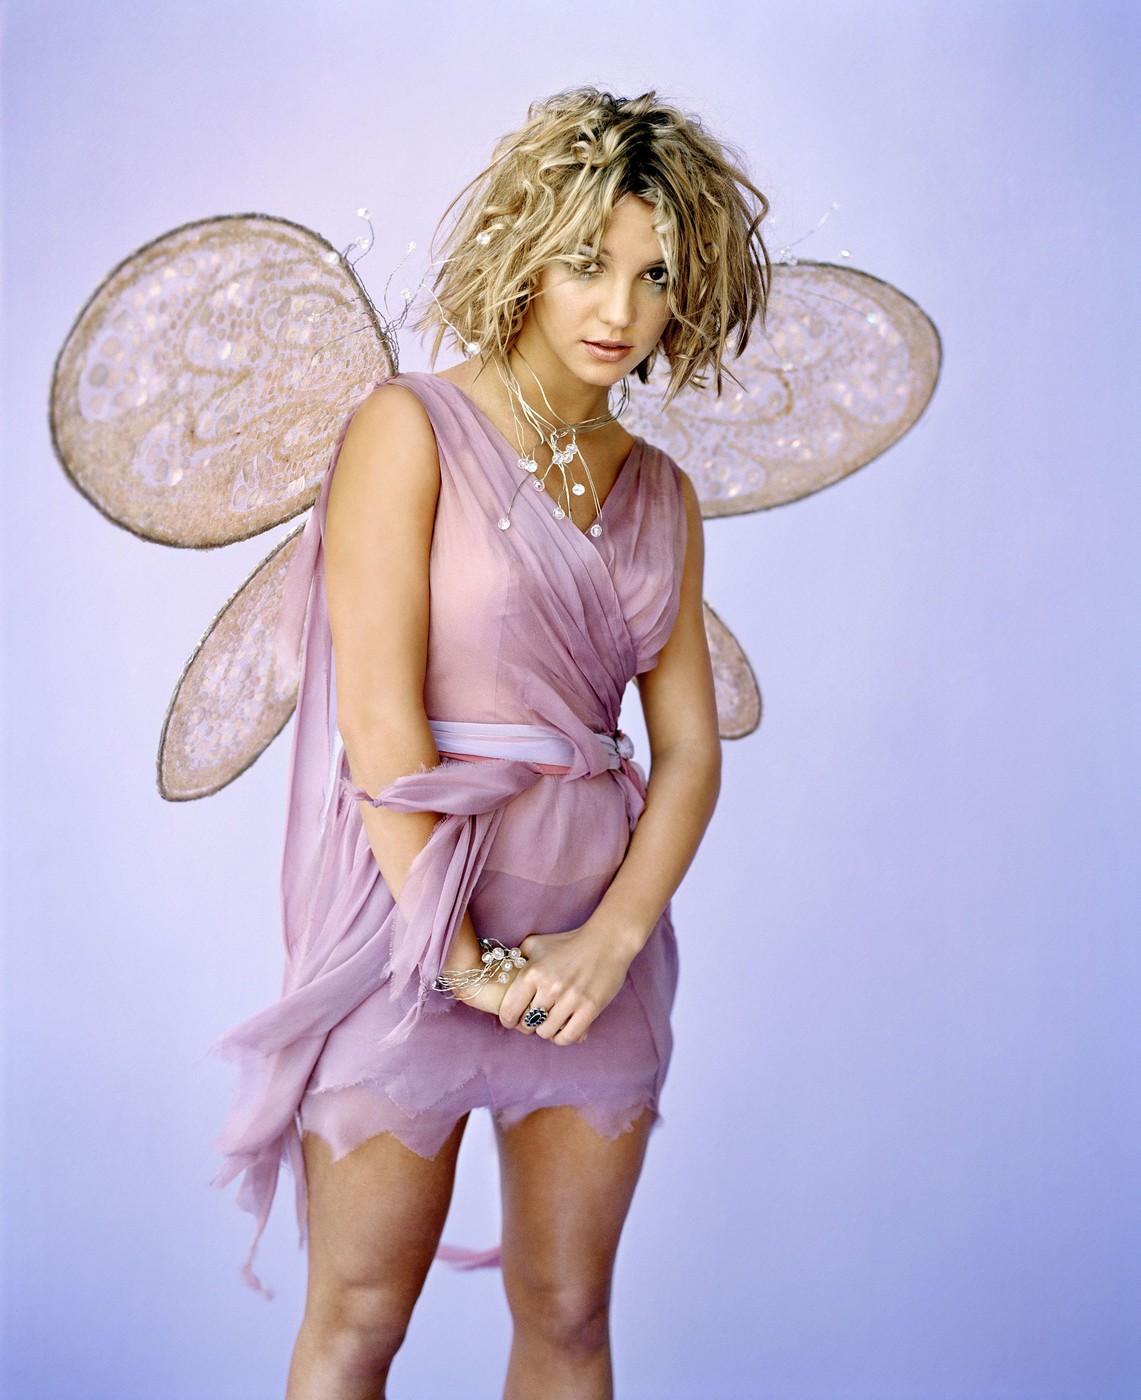 Britney20Spears004-vi_original.jpg